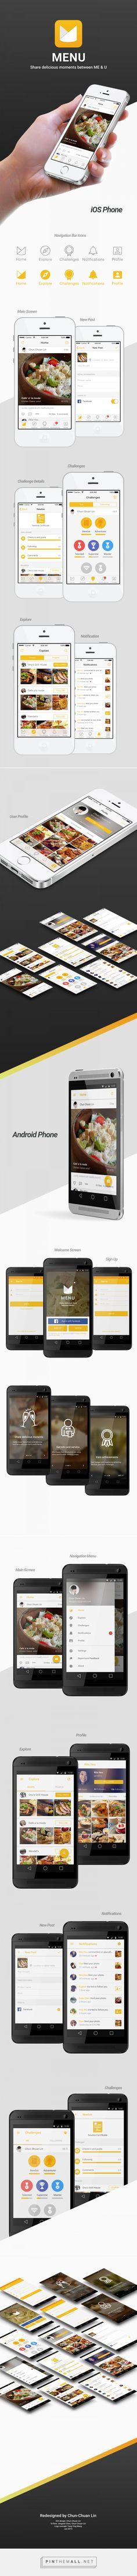 #iphone_app_design #android_app_design #material_design_app #cooking_app #social_app #productivity_app #gallery_app #clean_app_design #light_background_app_design #image_list_screen_design #image_grid_screen_design